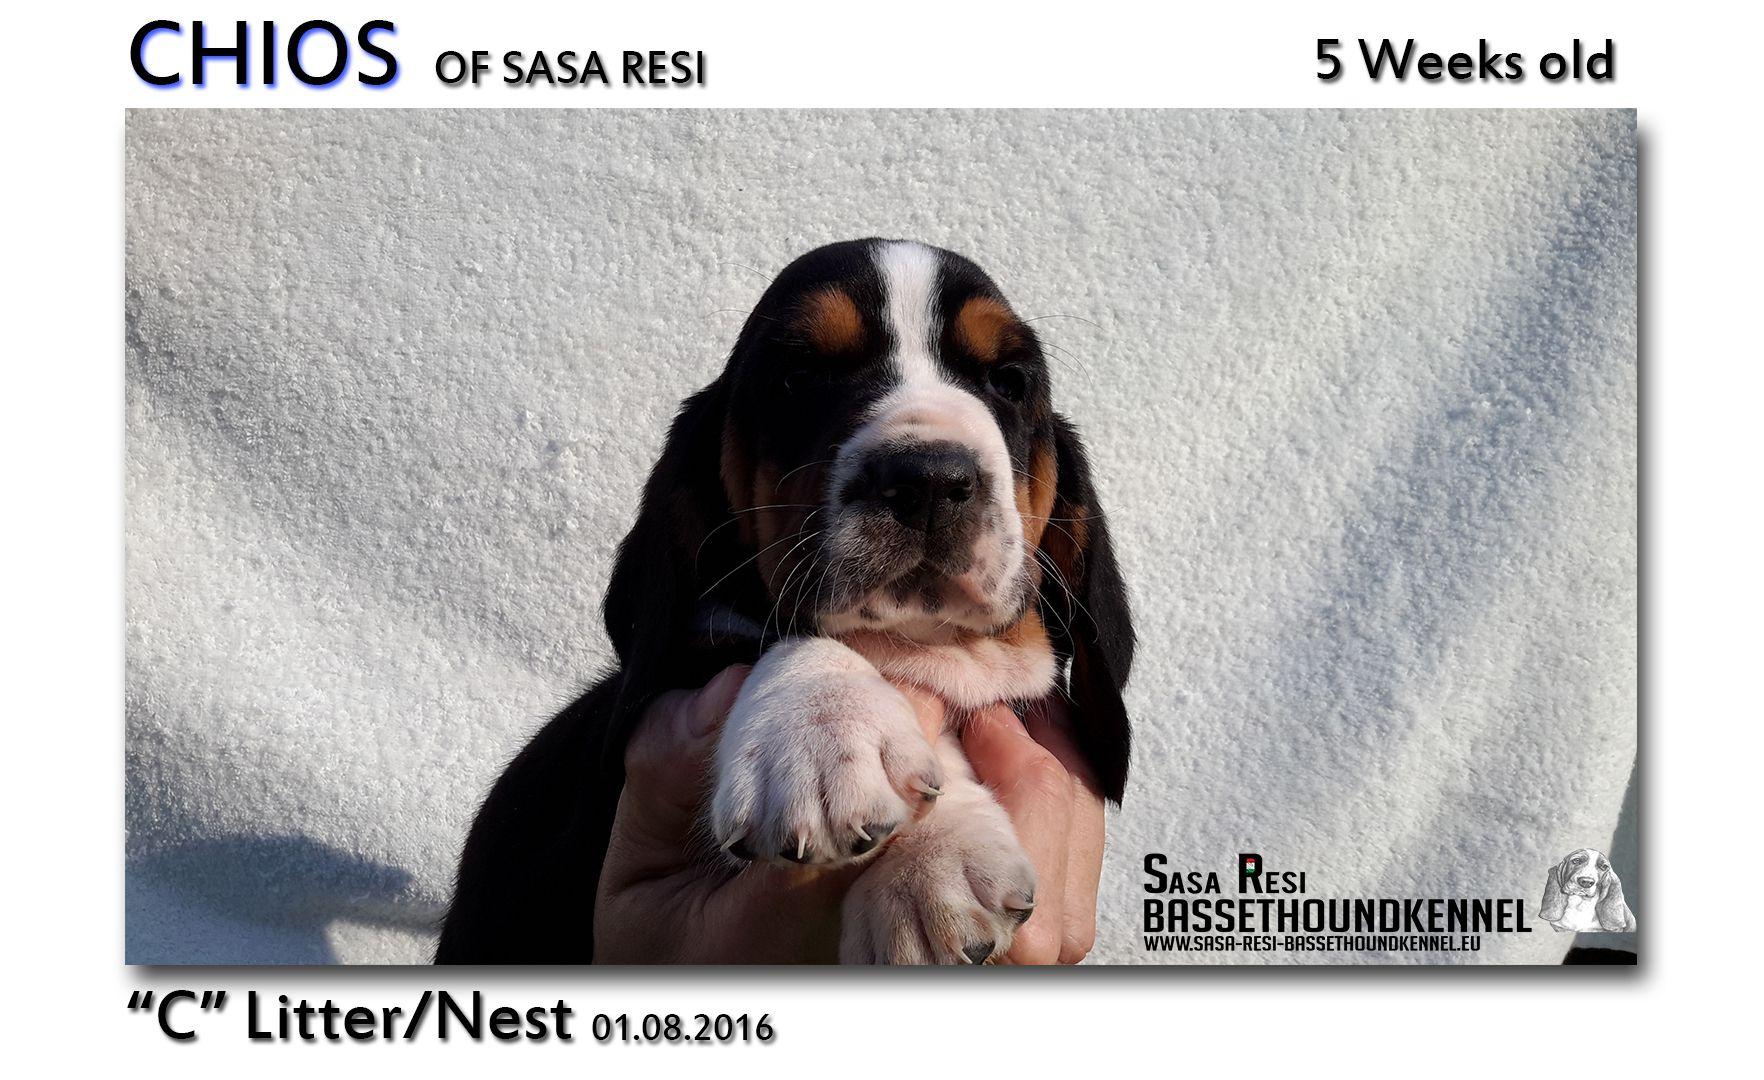 1 compressed 2 SaSa ReSi Bassethoundkennel